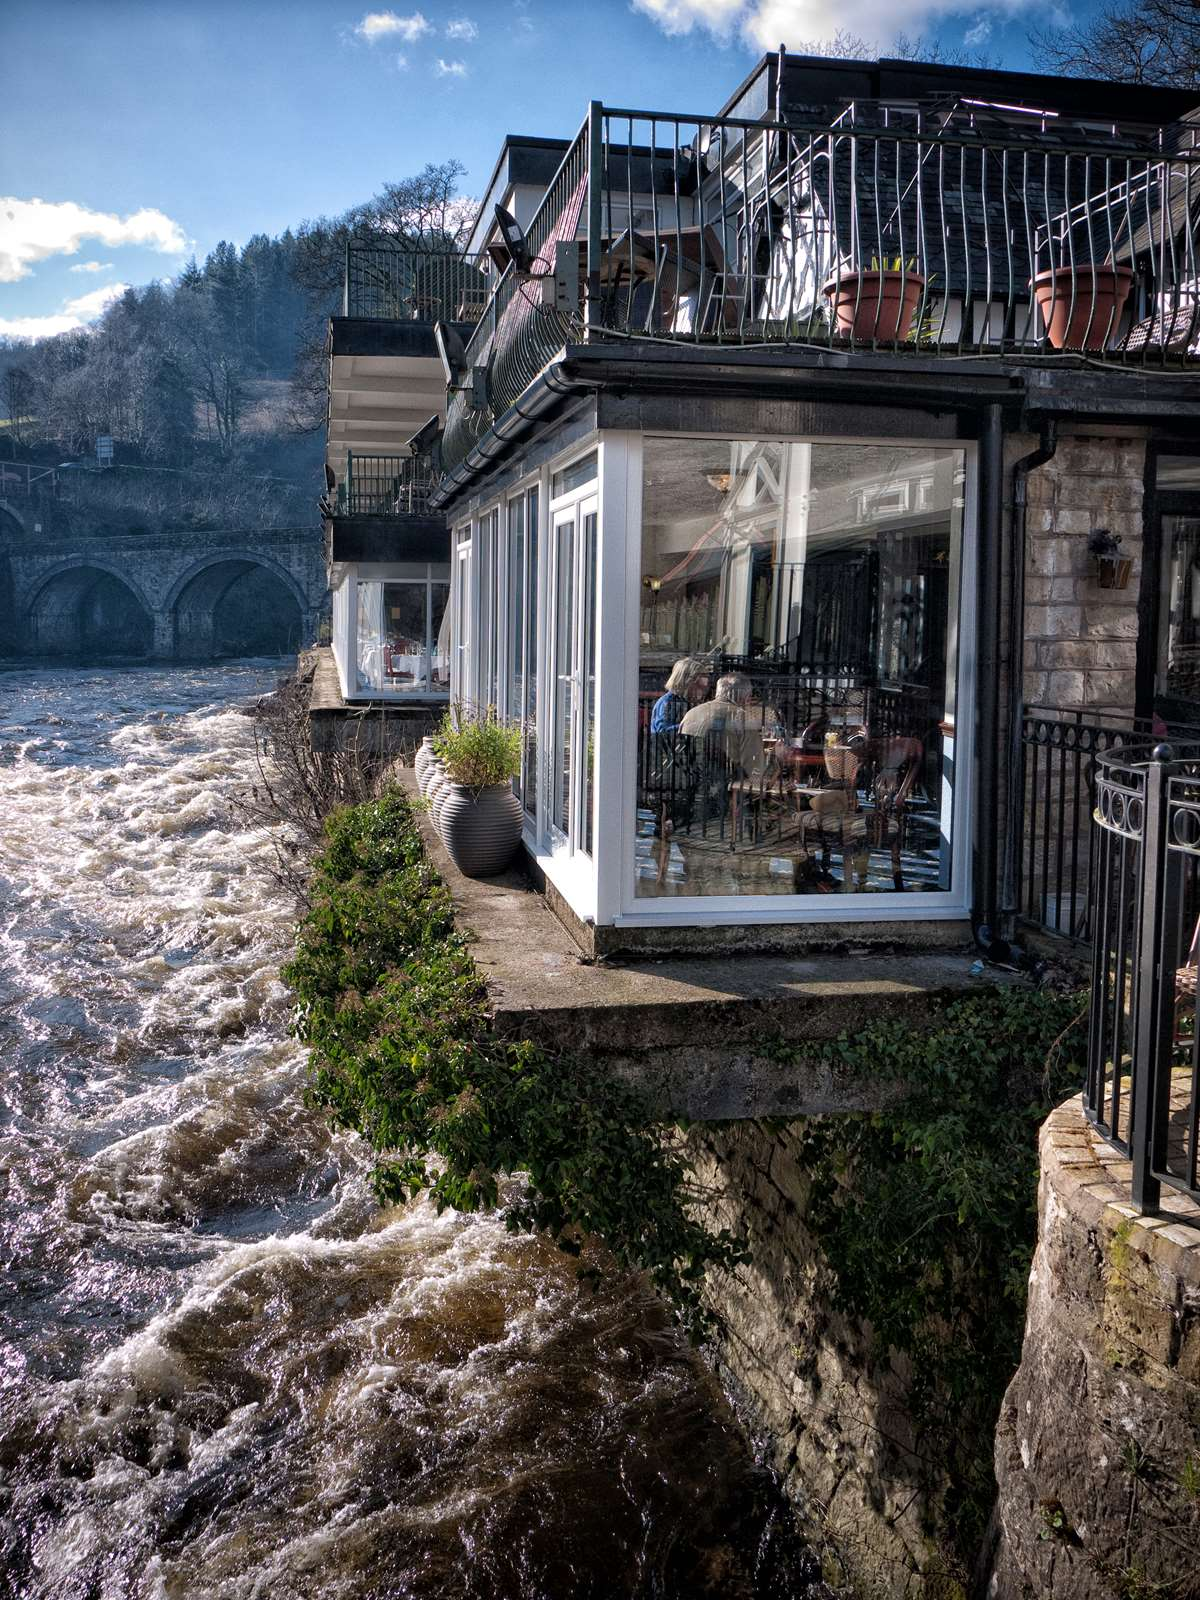 Chain bridge Hotel Llangollen